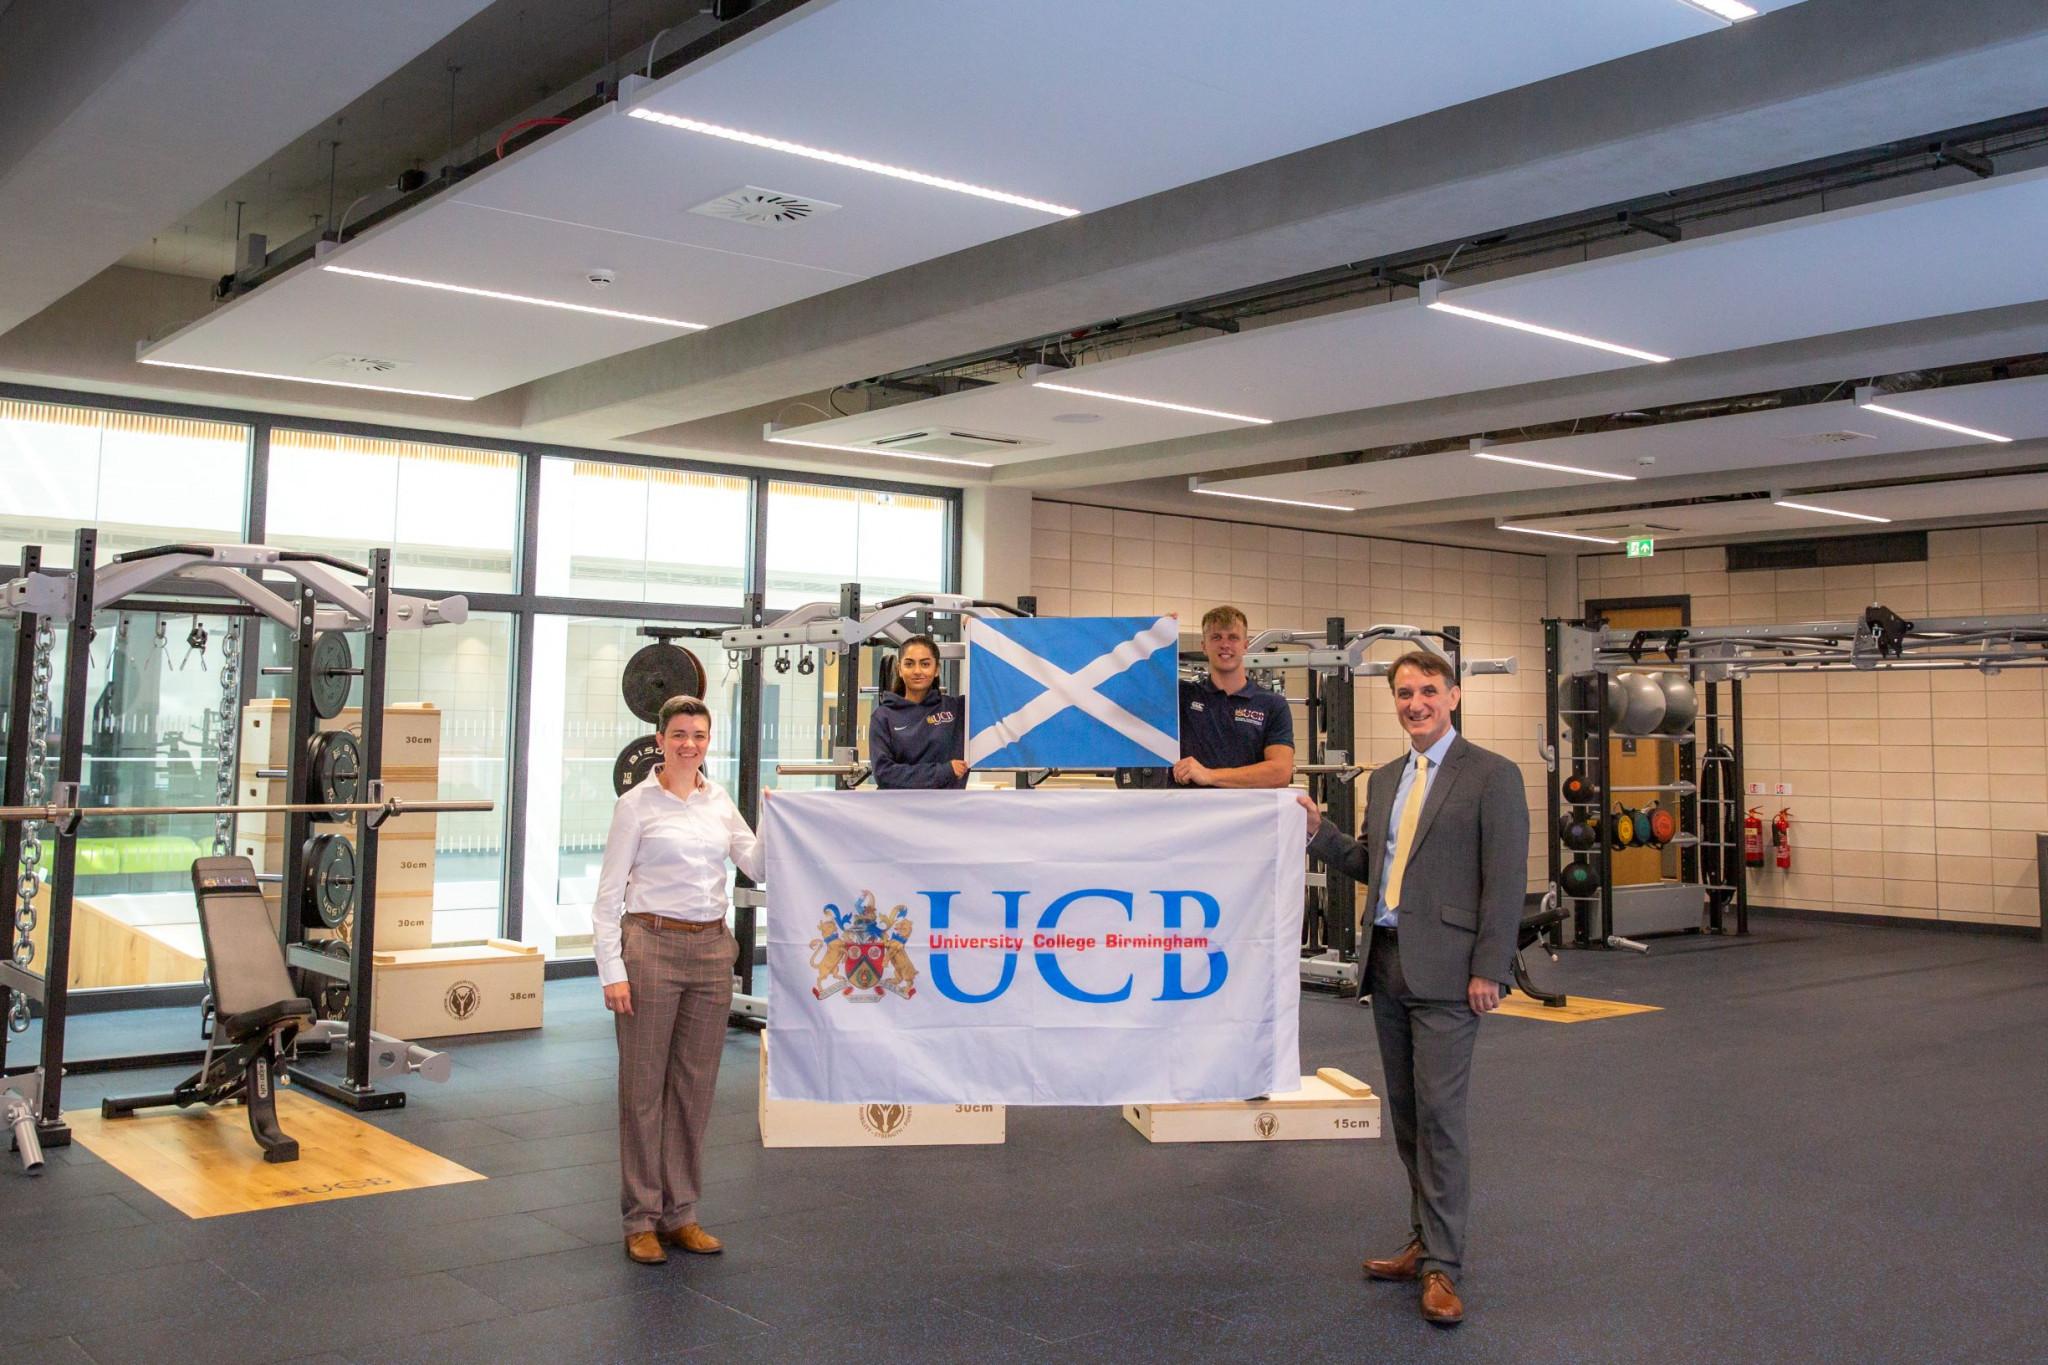 University College Birmingham to host Scotland at 2022 Commonwealth Games